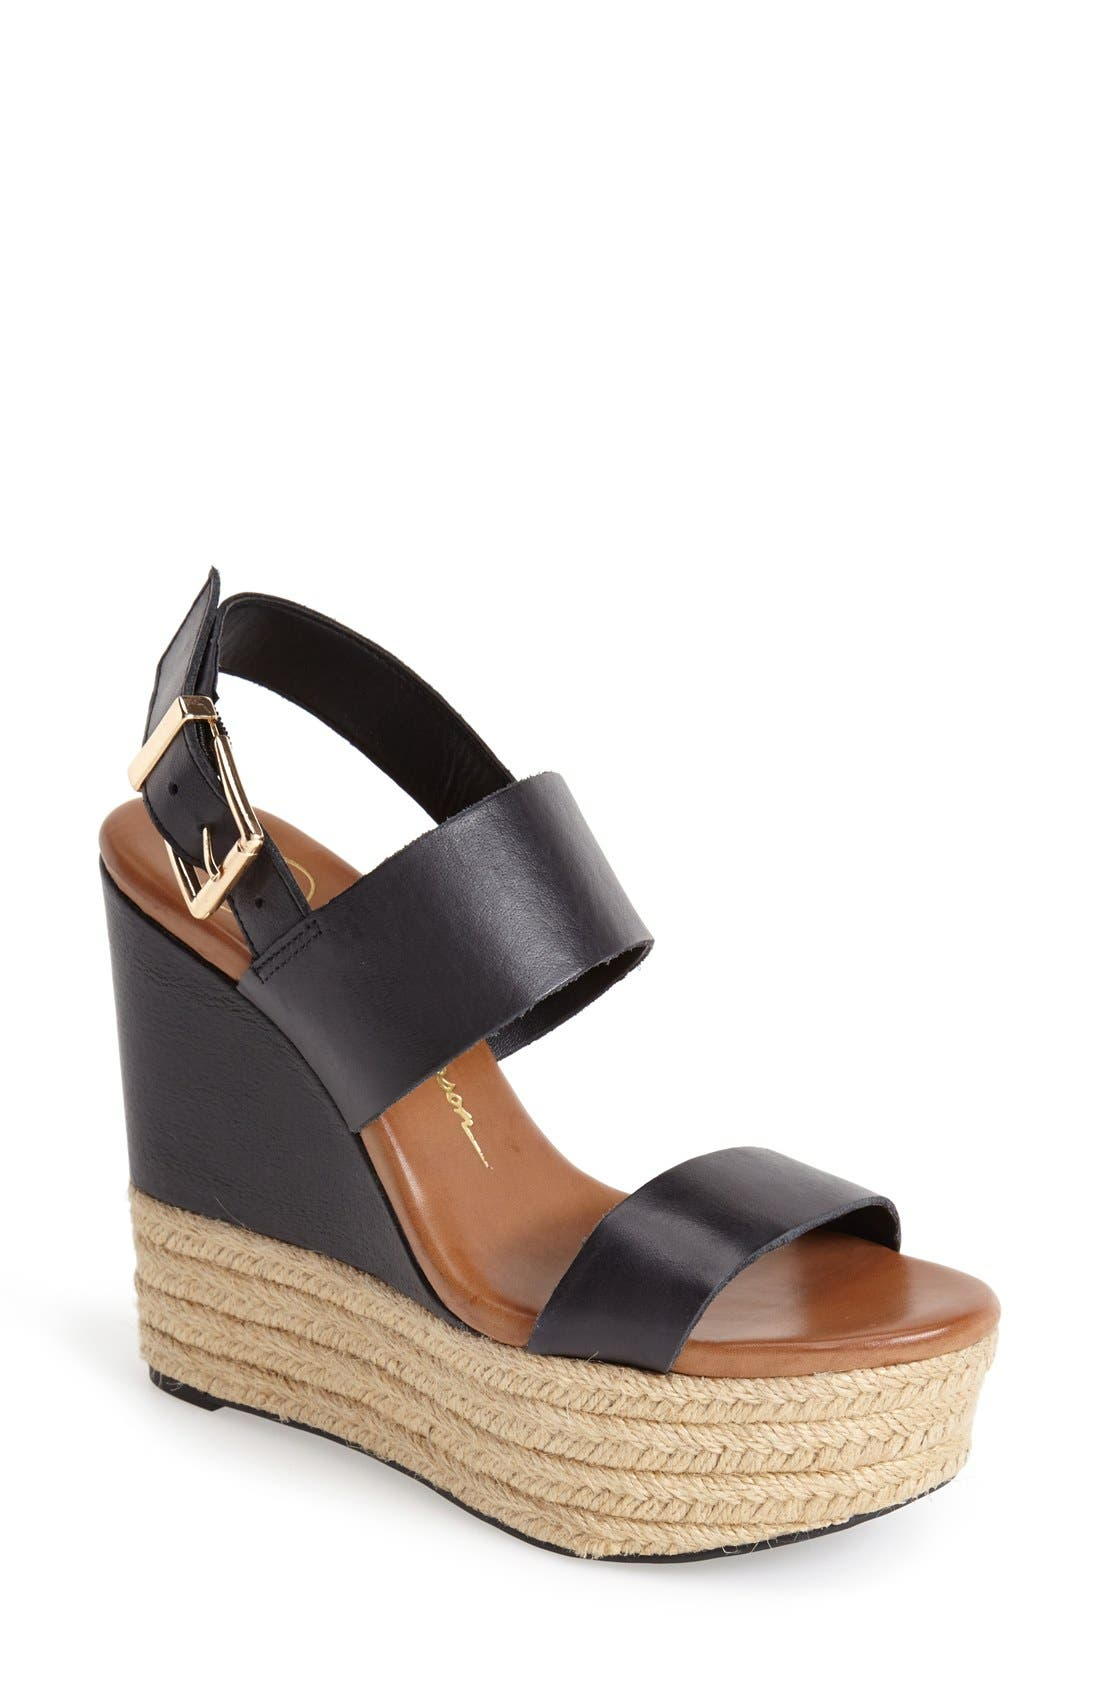 'Allyn' Wedge Platform Leather Sandal,                             Main thumbnail 1, color,                             001